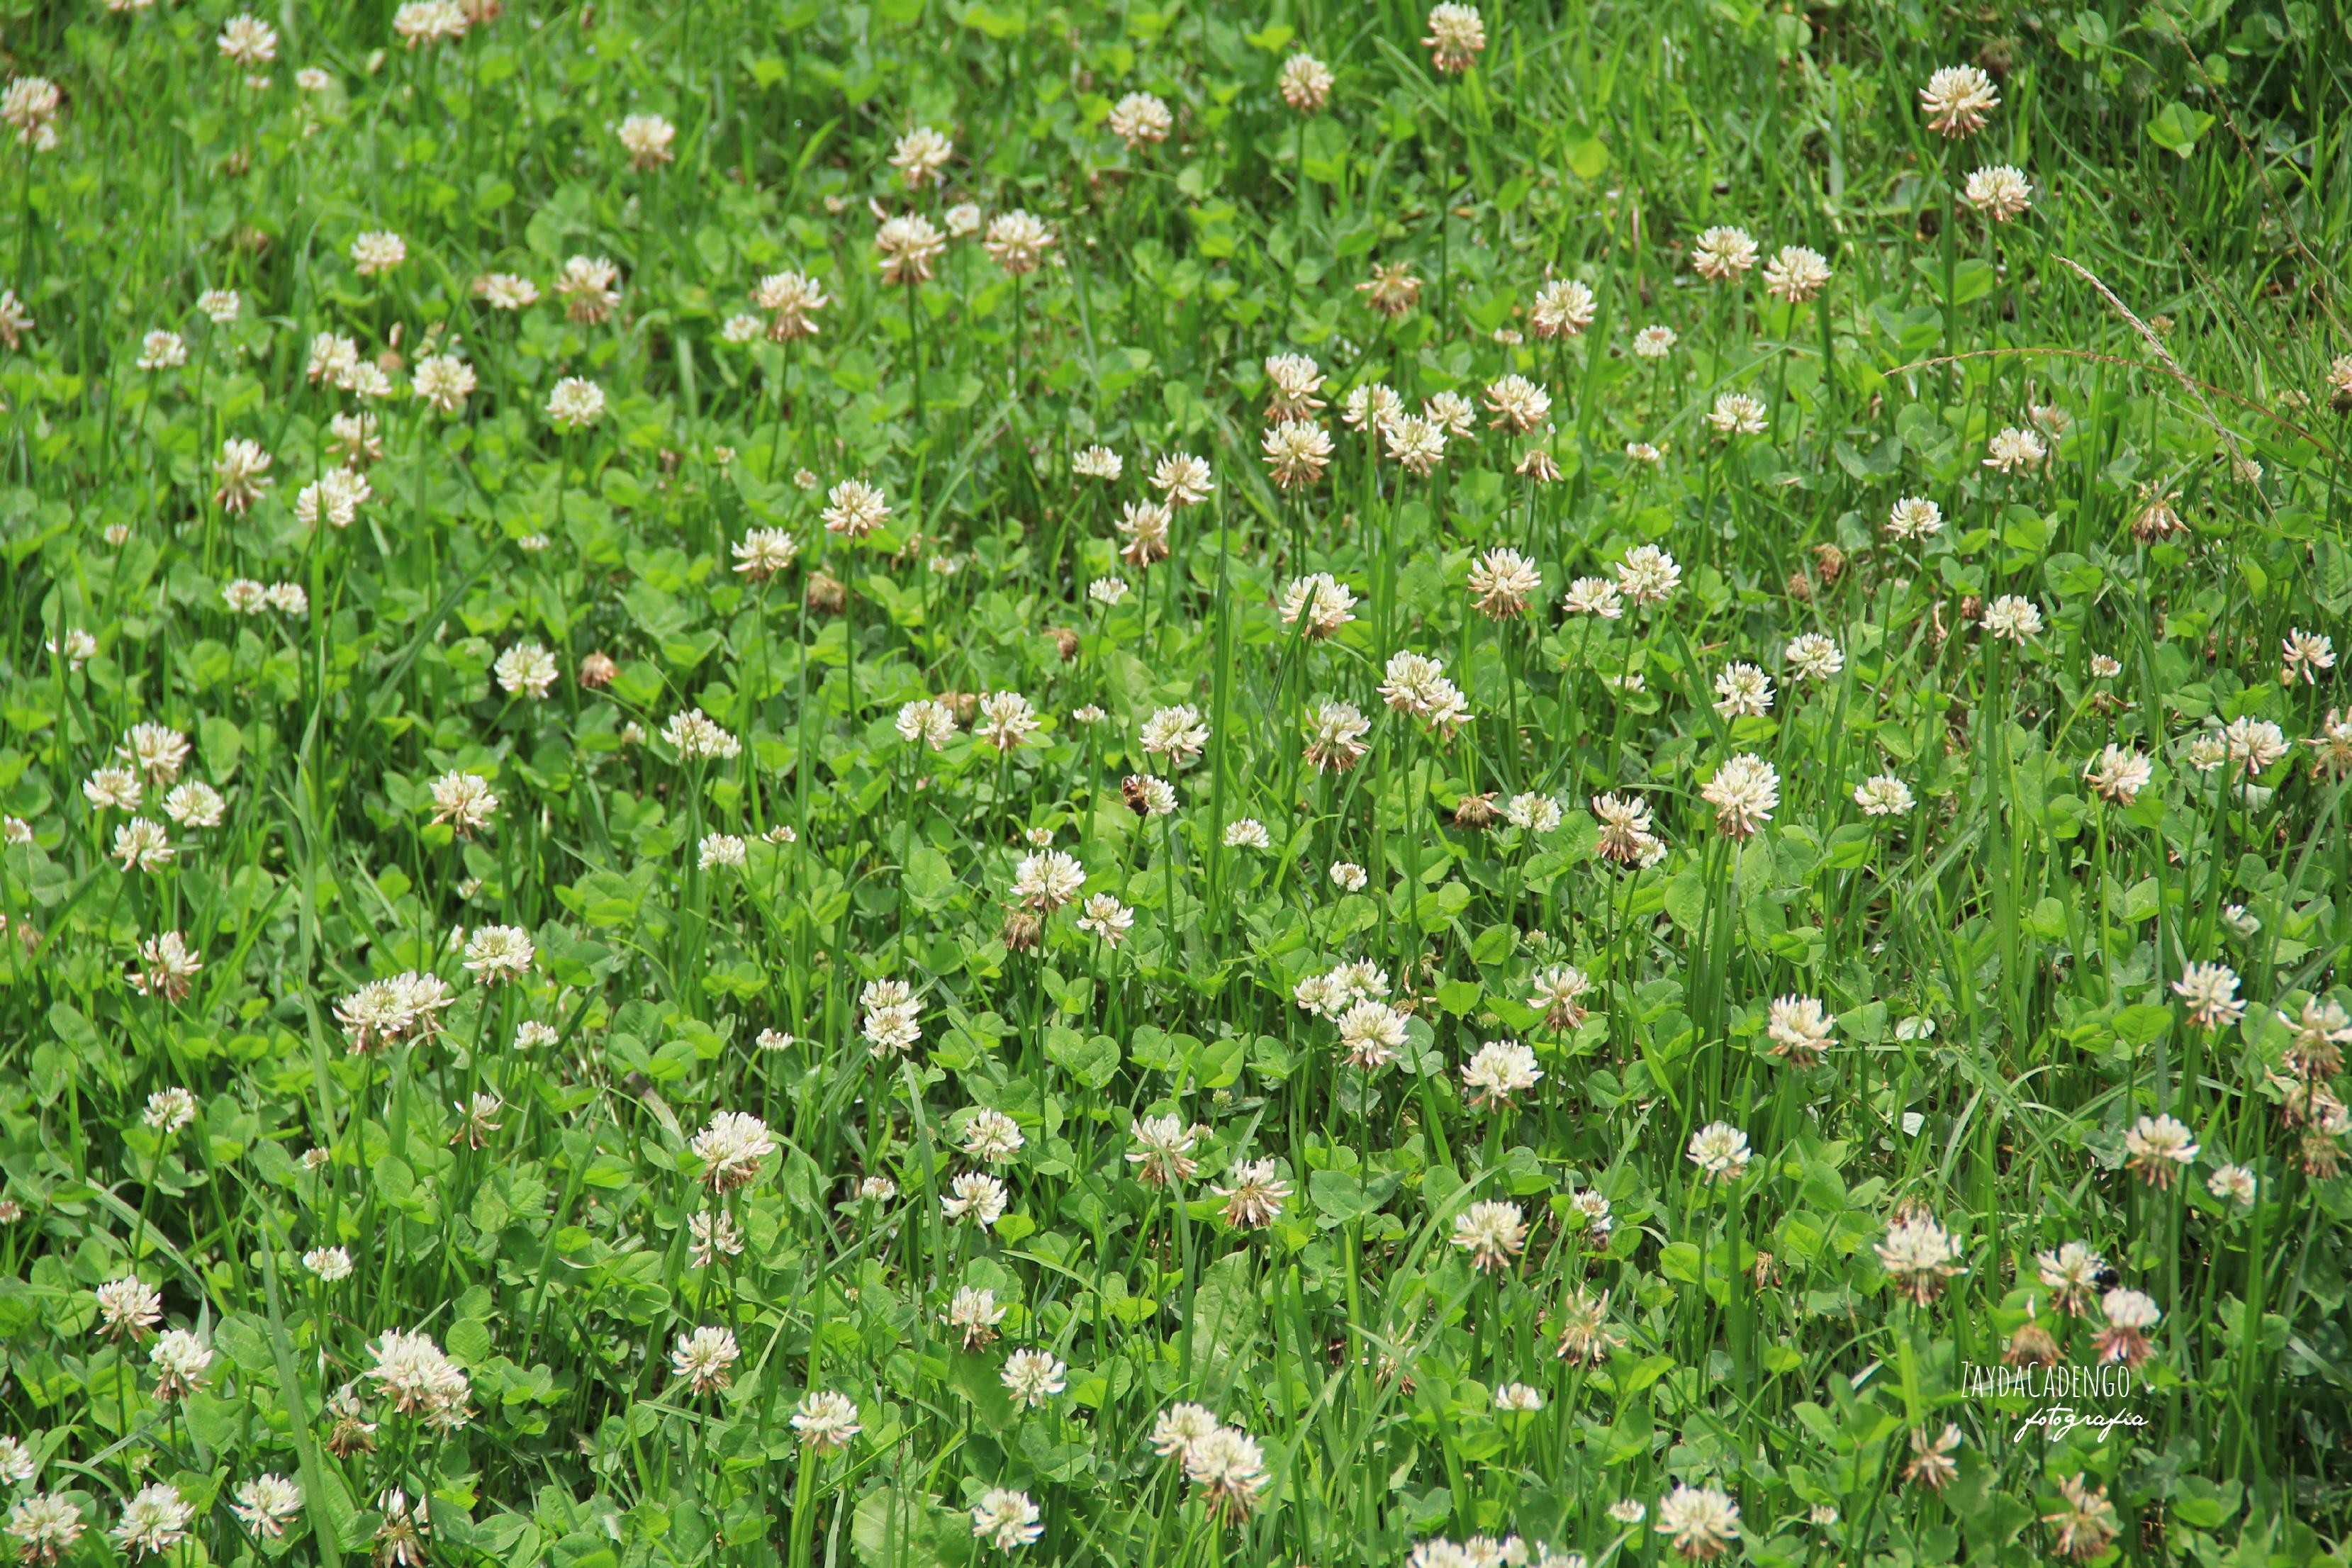 Free images nature white lawn meadow flower herb produce nature plant white lawn meadow flower spring herb produce garden flora plants wildflower flowers shrub pistil mightylinksfo